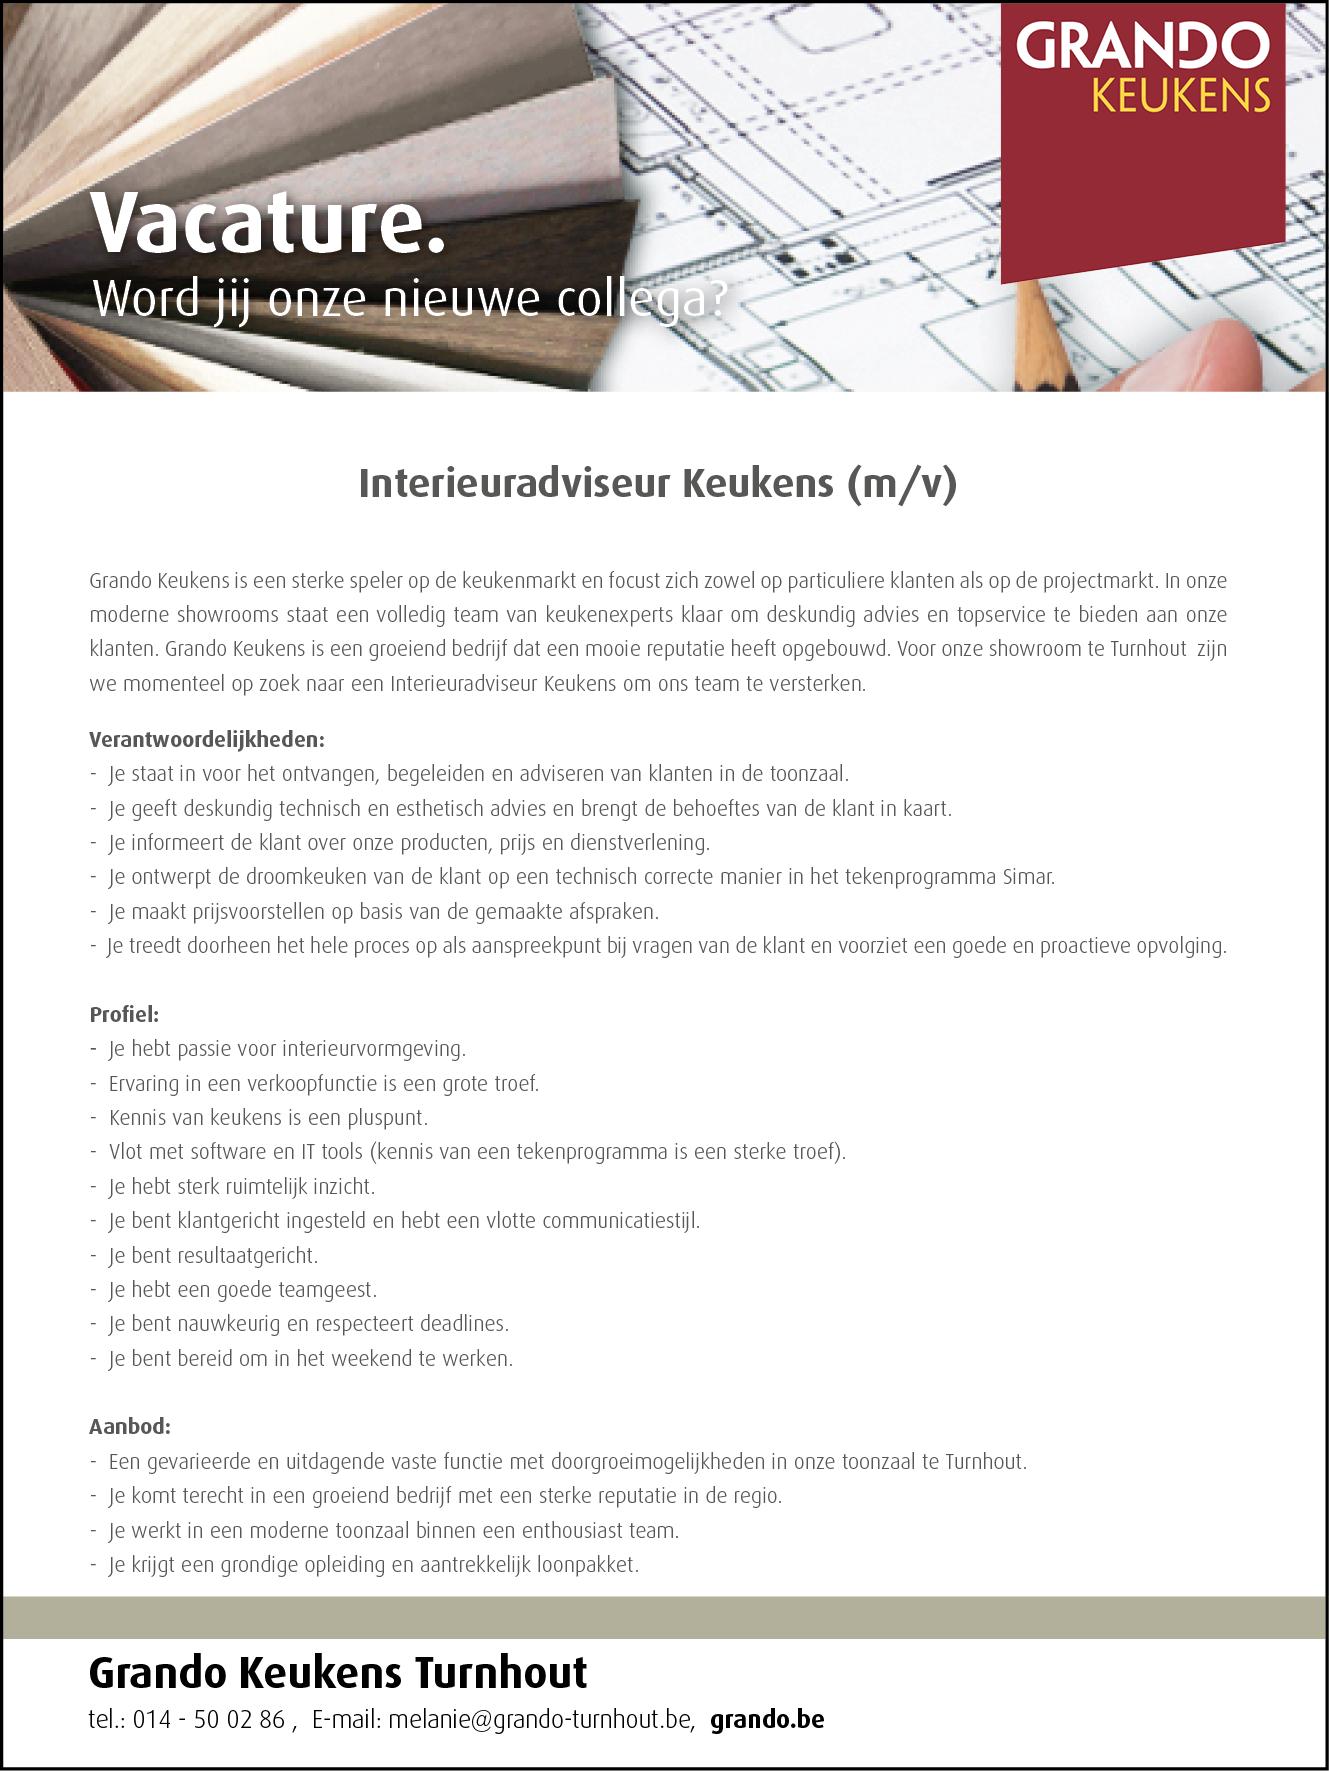 150x200 Vacature Turnhout Interieuradviseur keukens 2021.png